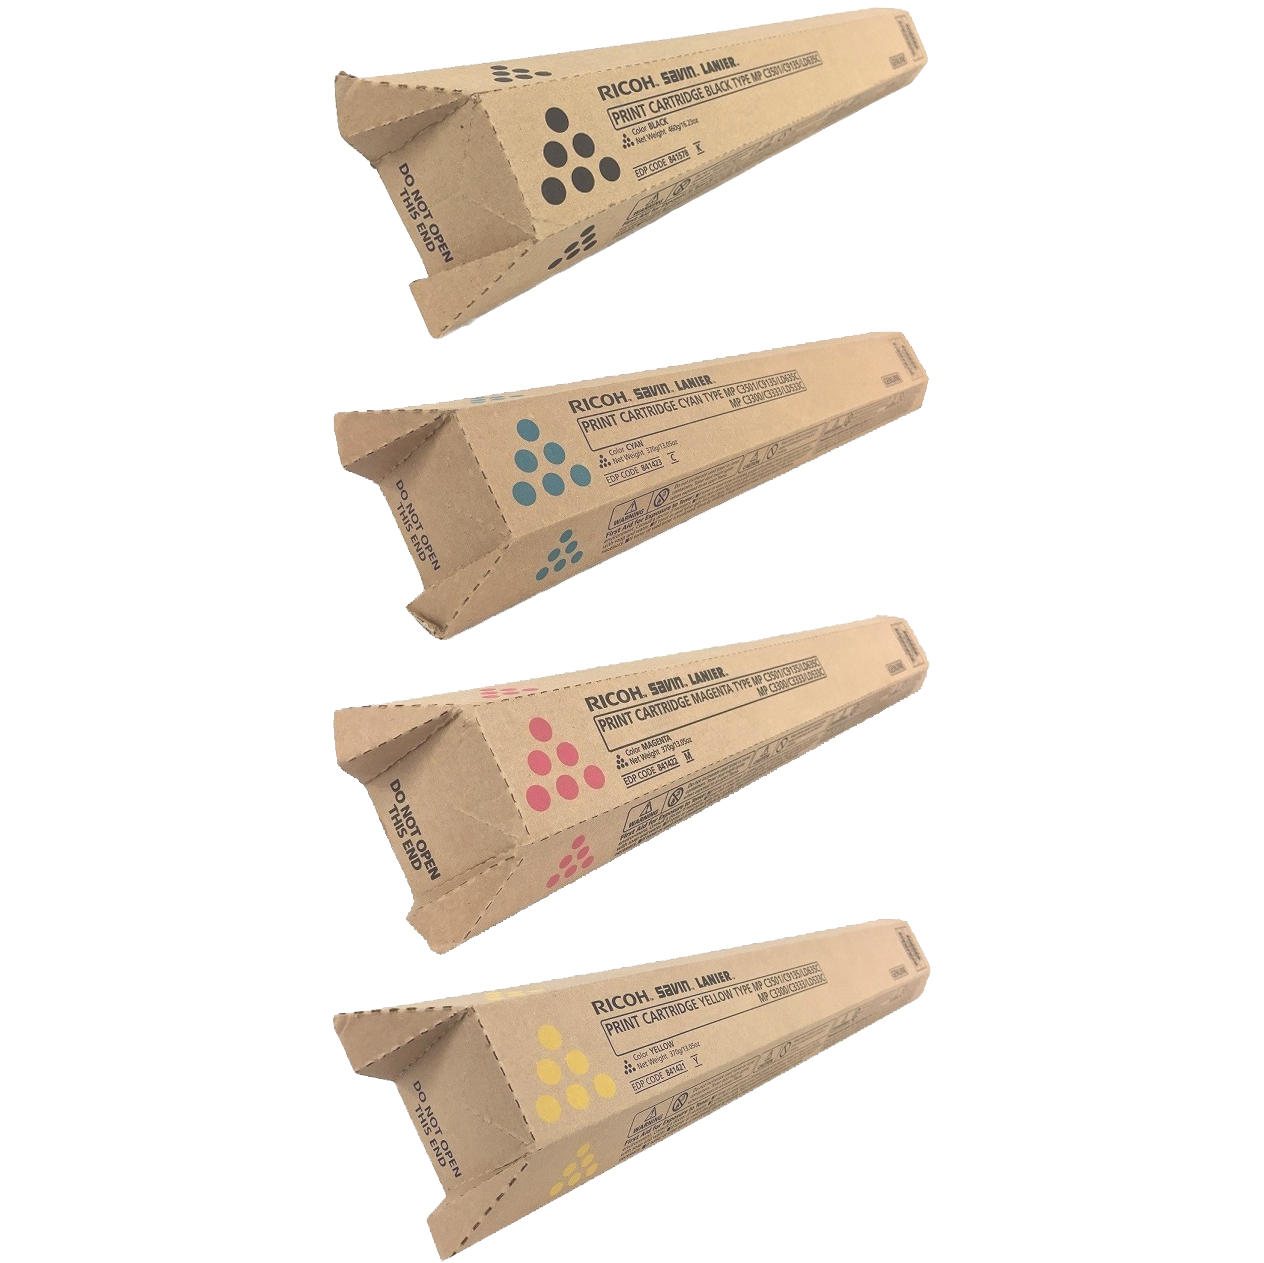 Ricoh MP-C3501 Set | 841578 841421 841422 841423 | Original Ricoh Laser Toner Cartridges – Black, Cyan, Magenta, Yellow